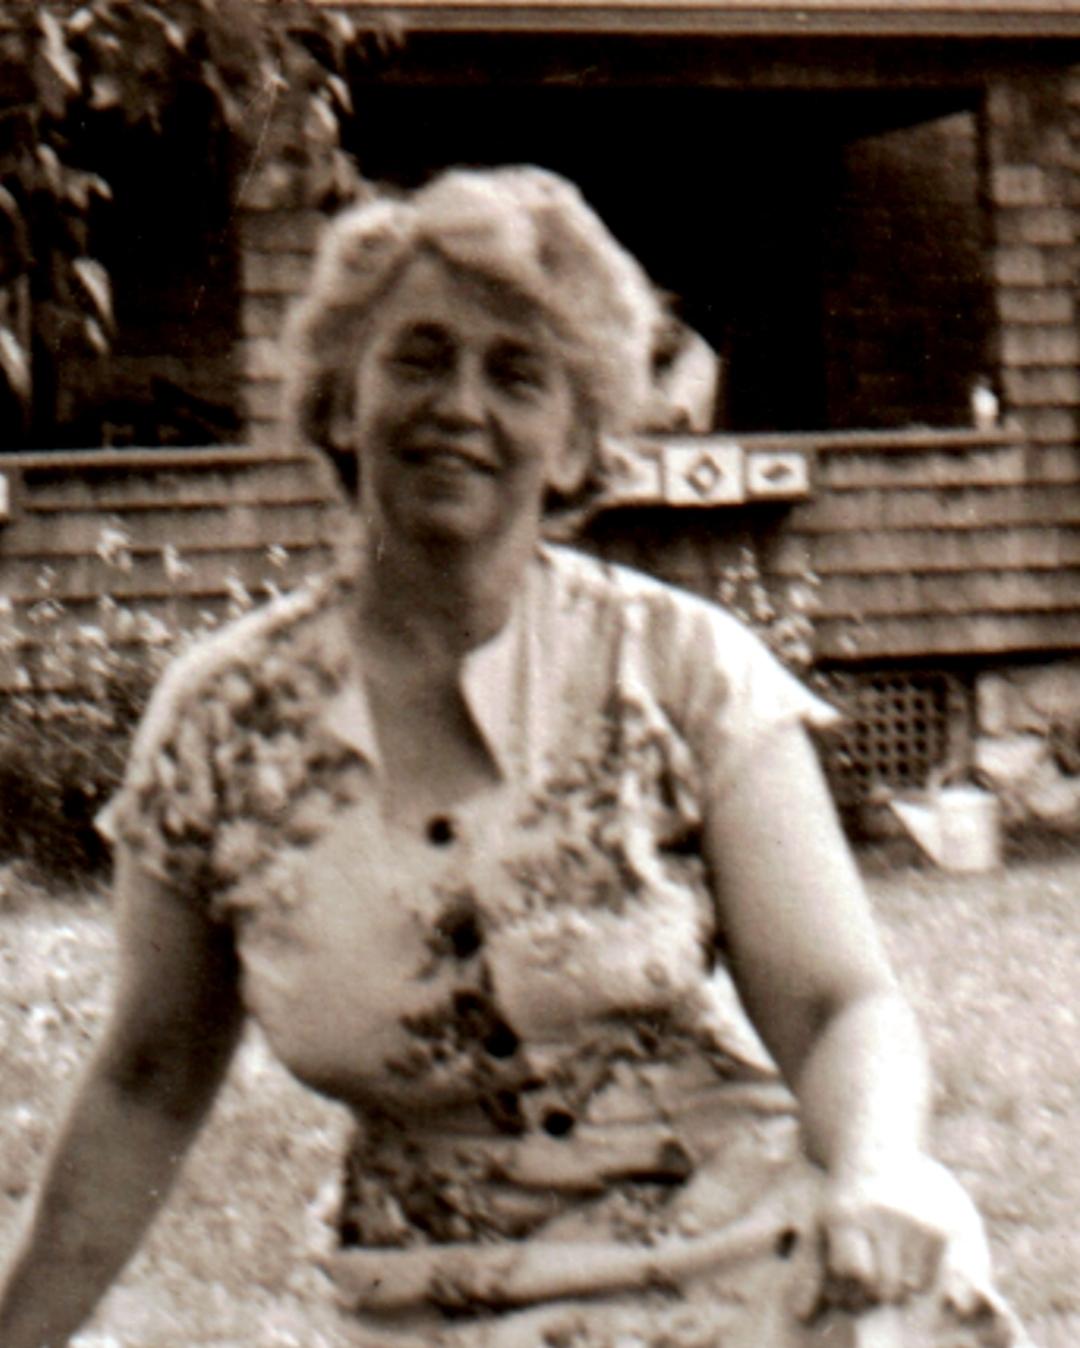 Charito Solis (1933?998) Adult pics Valerie Tian,Jill Eikenberry born January 21, 1947 (age 71)